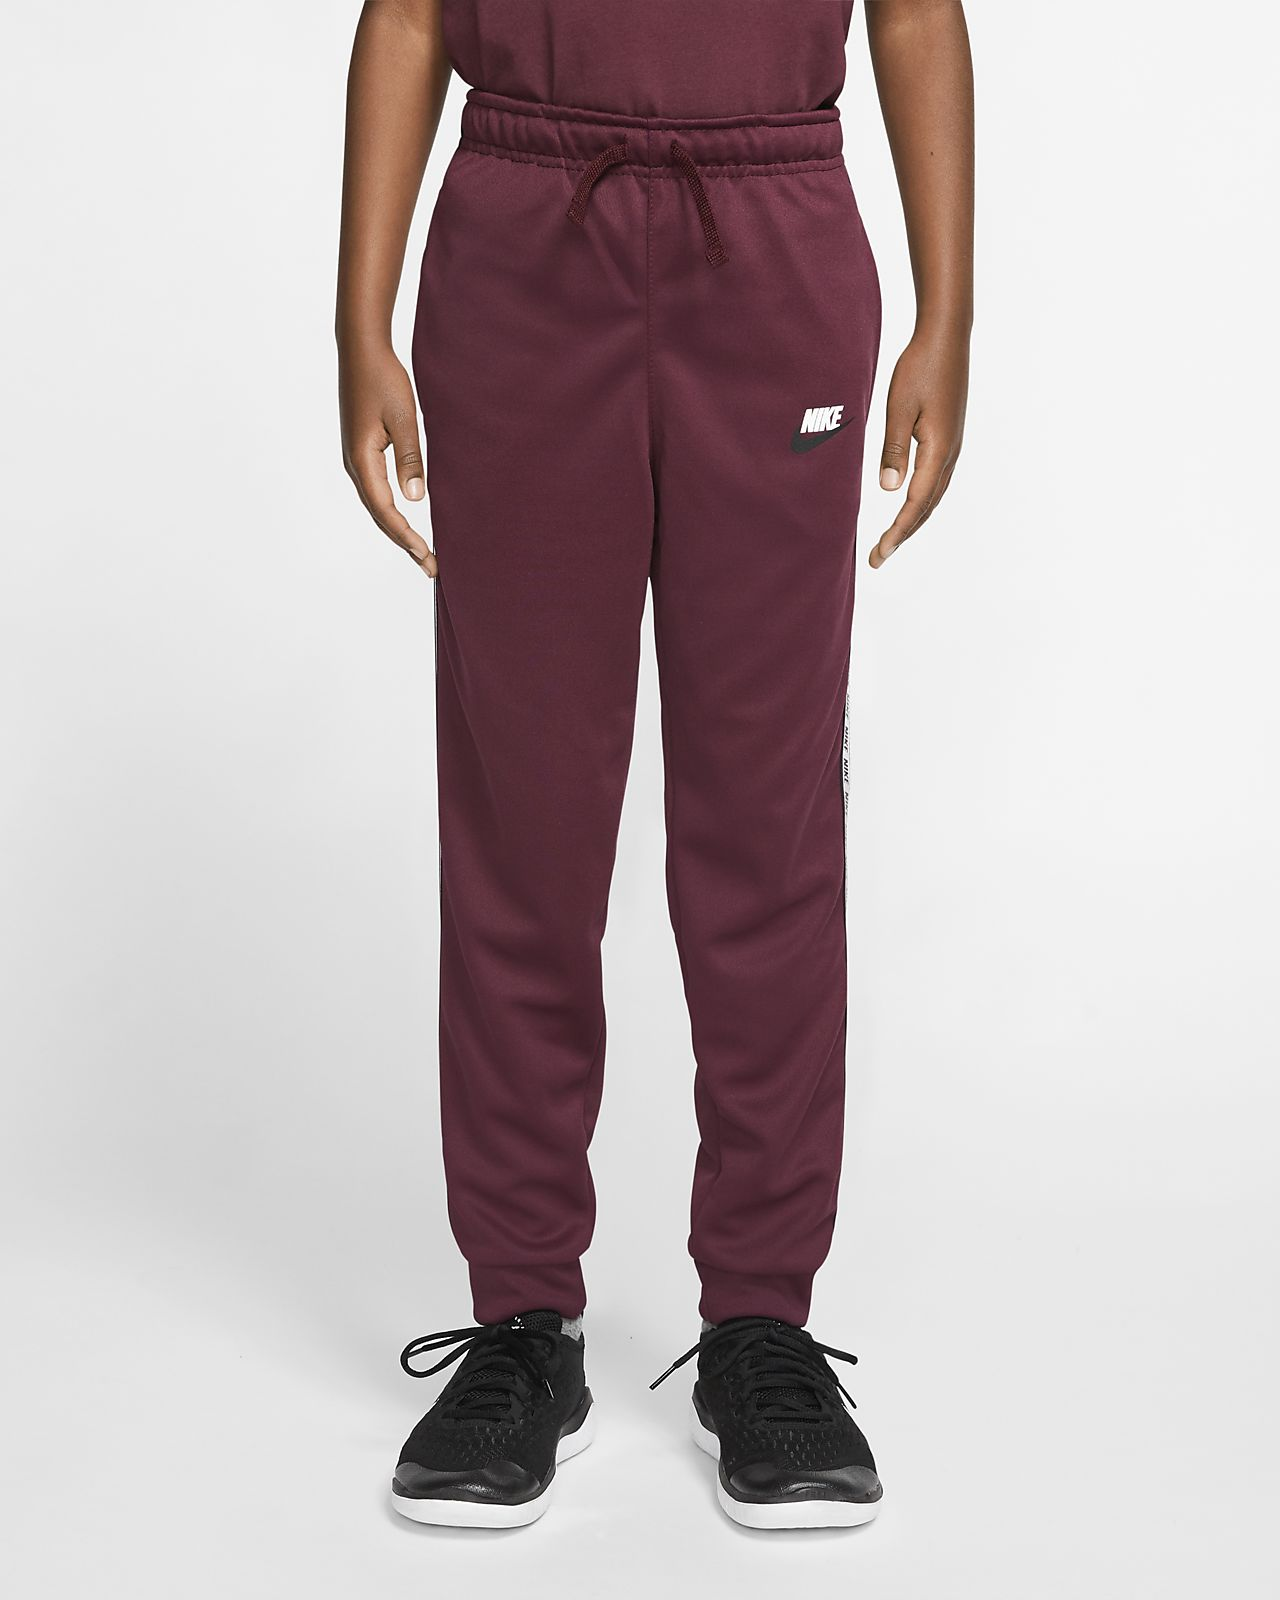 Calças Nike Sportswear Júnior